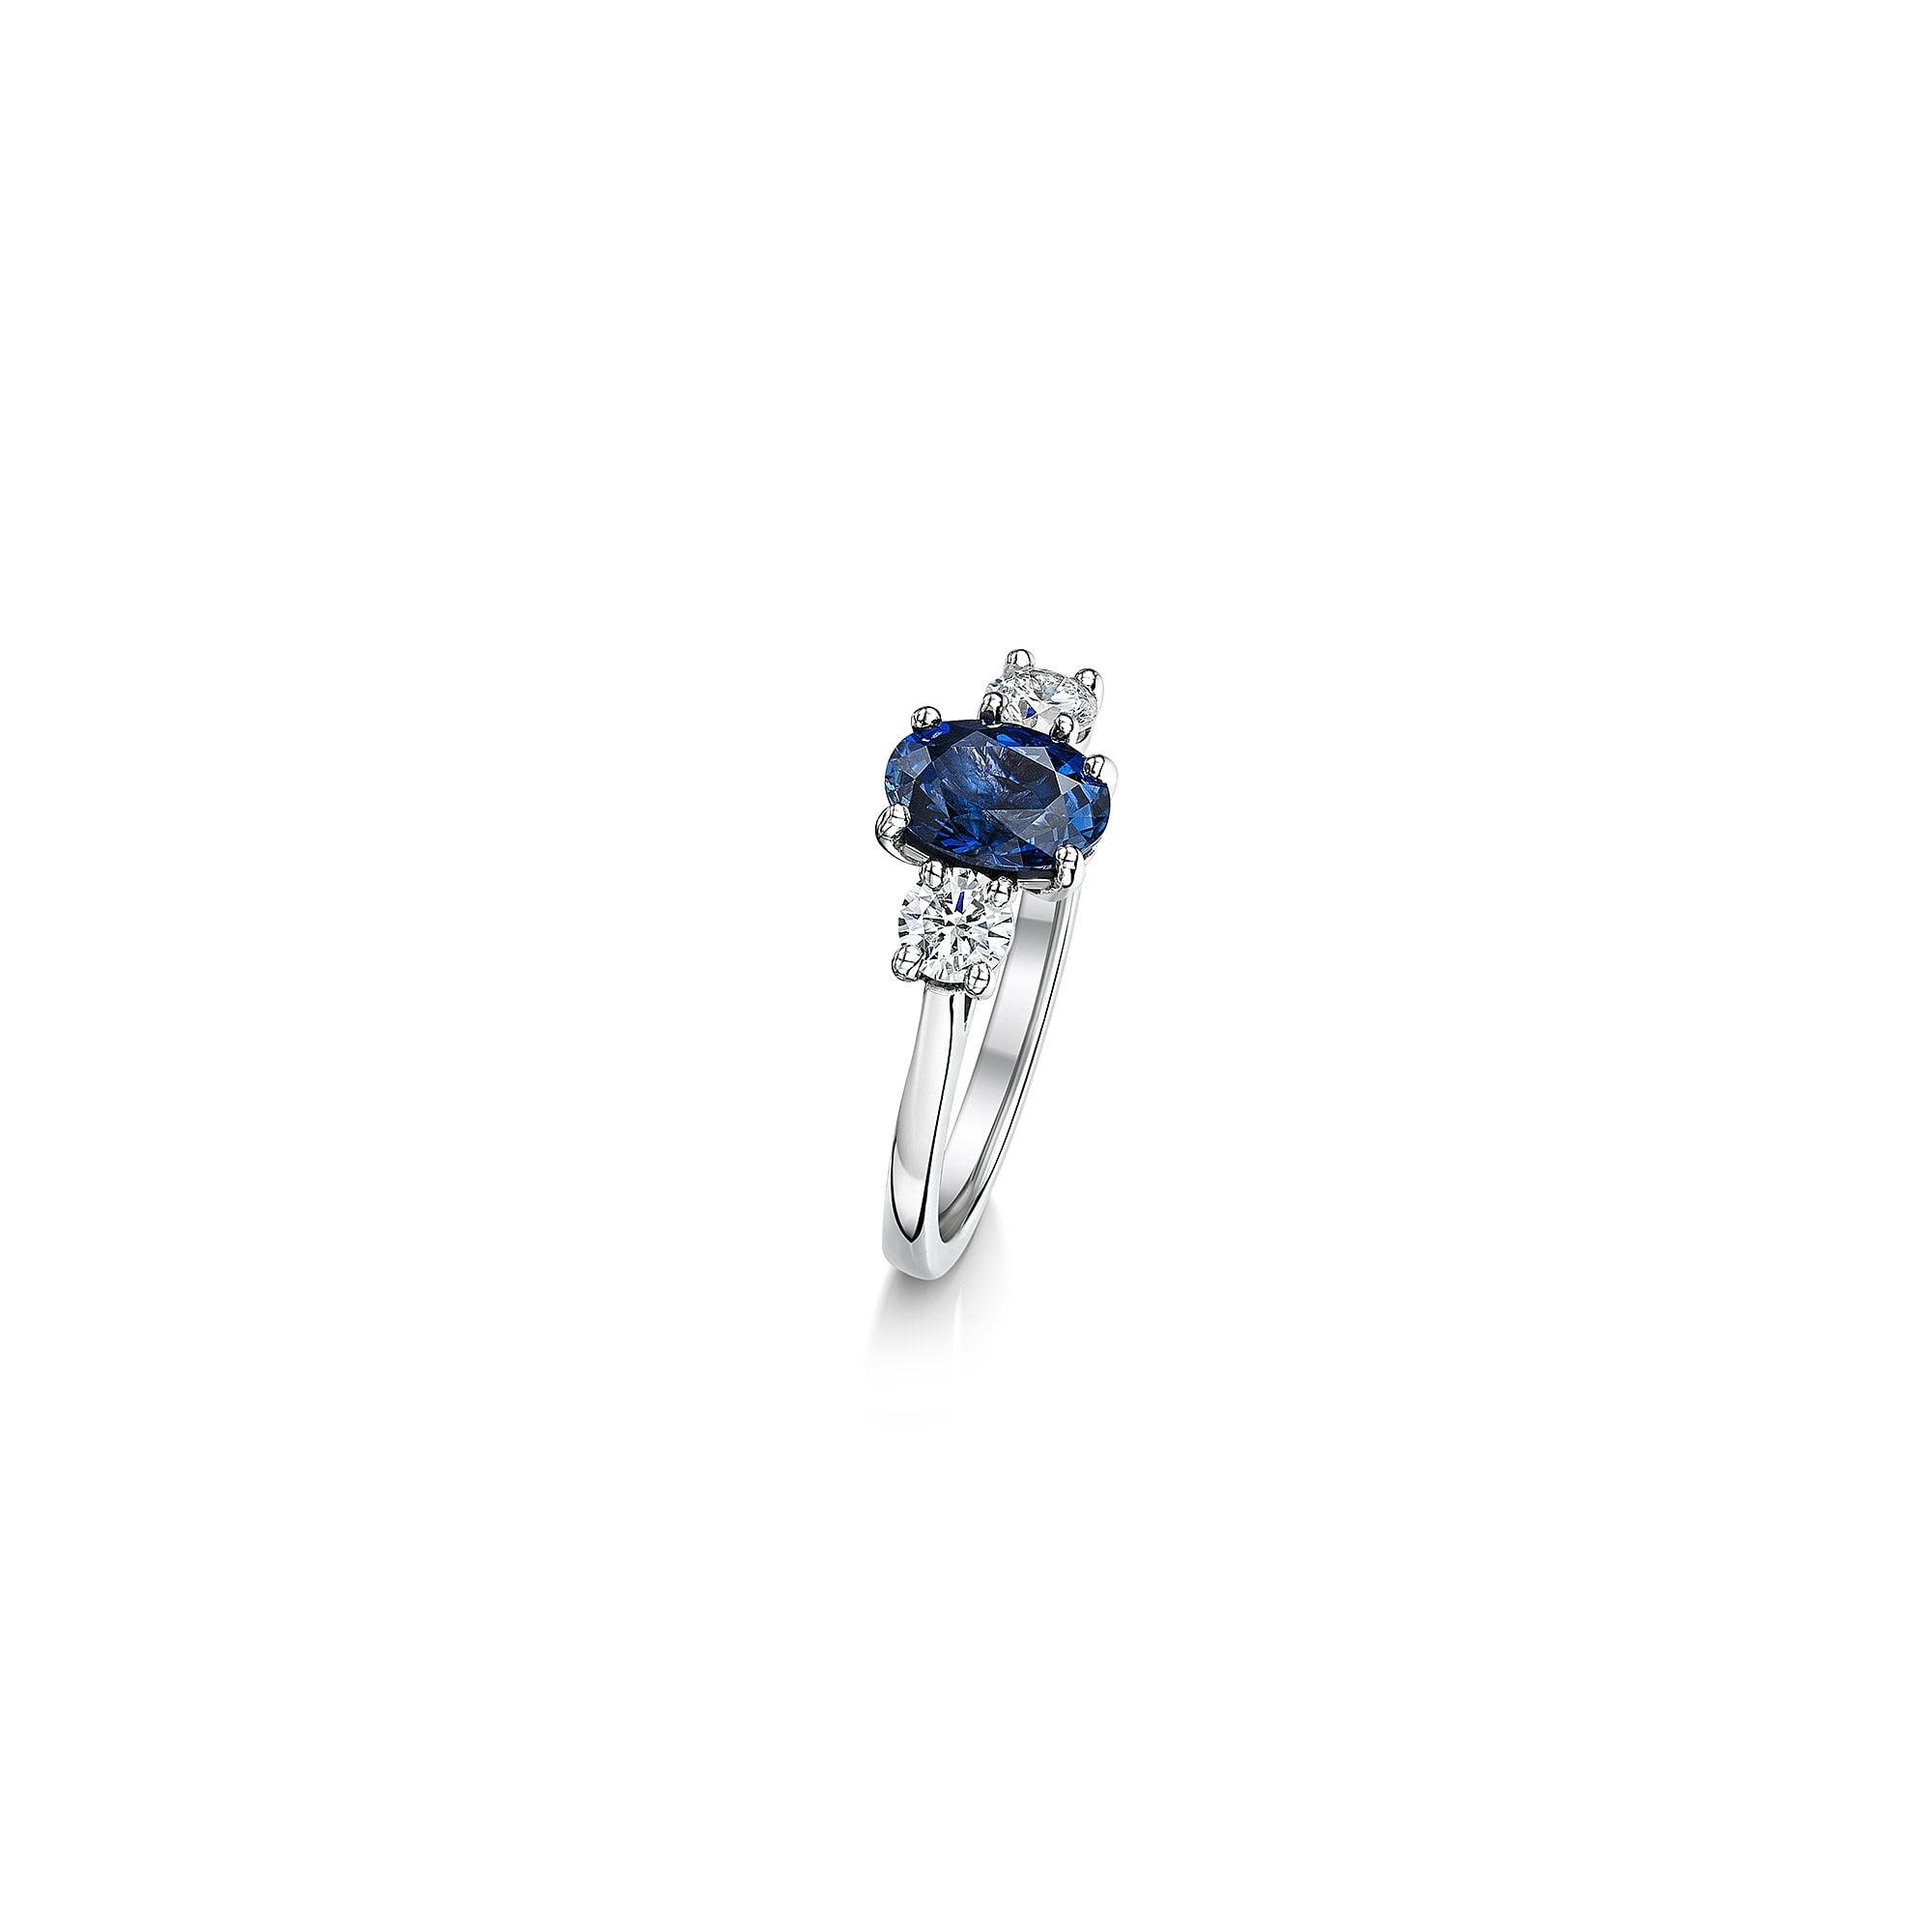 9ab17c77d5a6b Platinum One Carat Sapphire and Diamond Three Stone Ring RPN3728